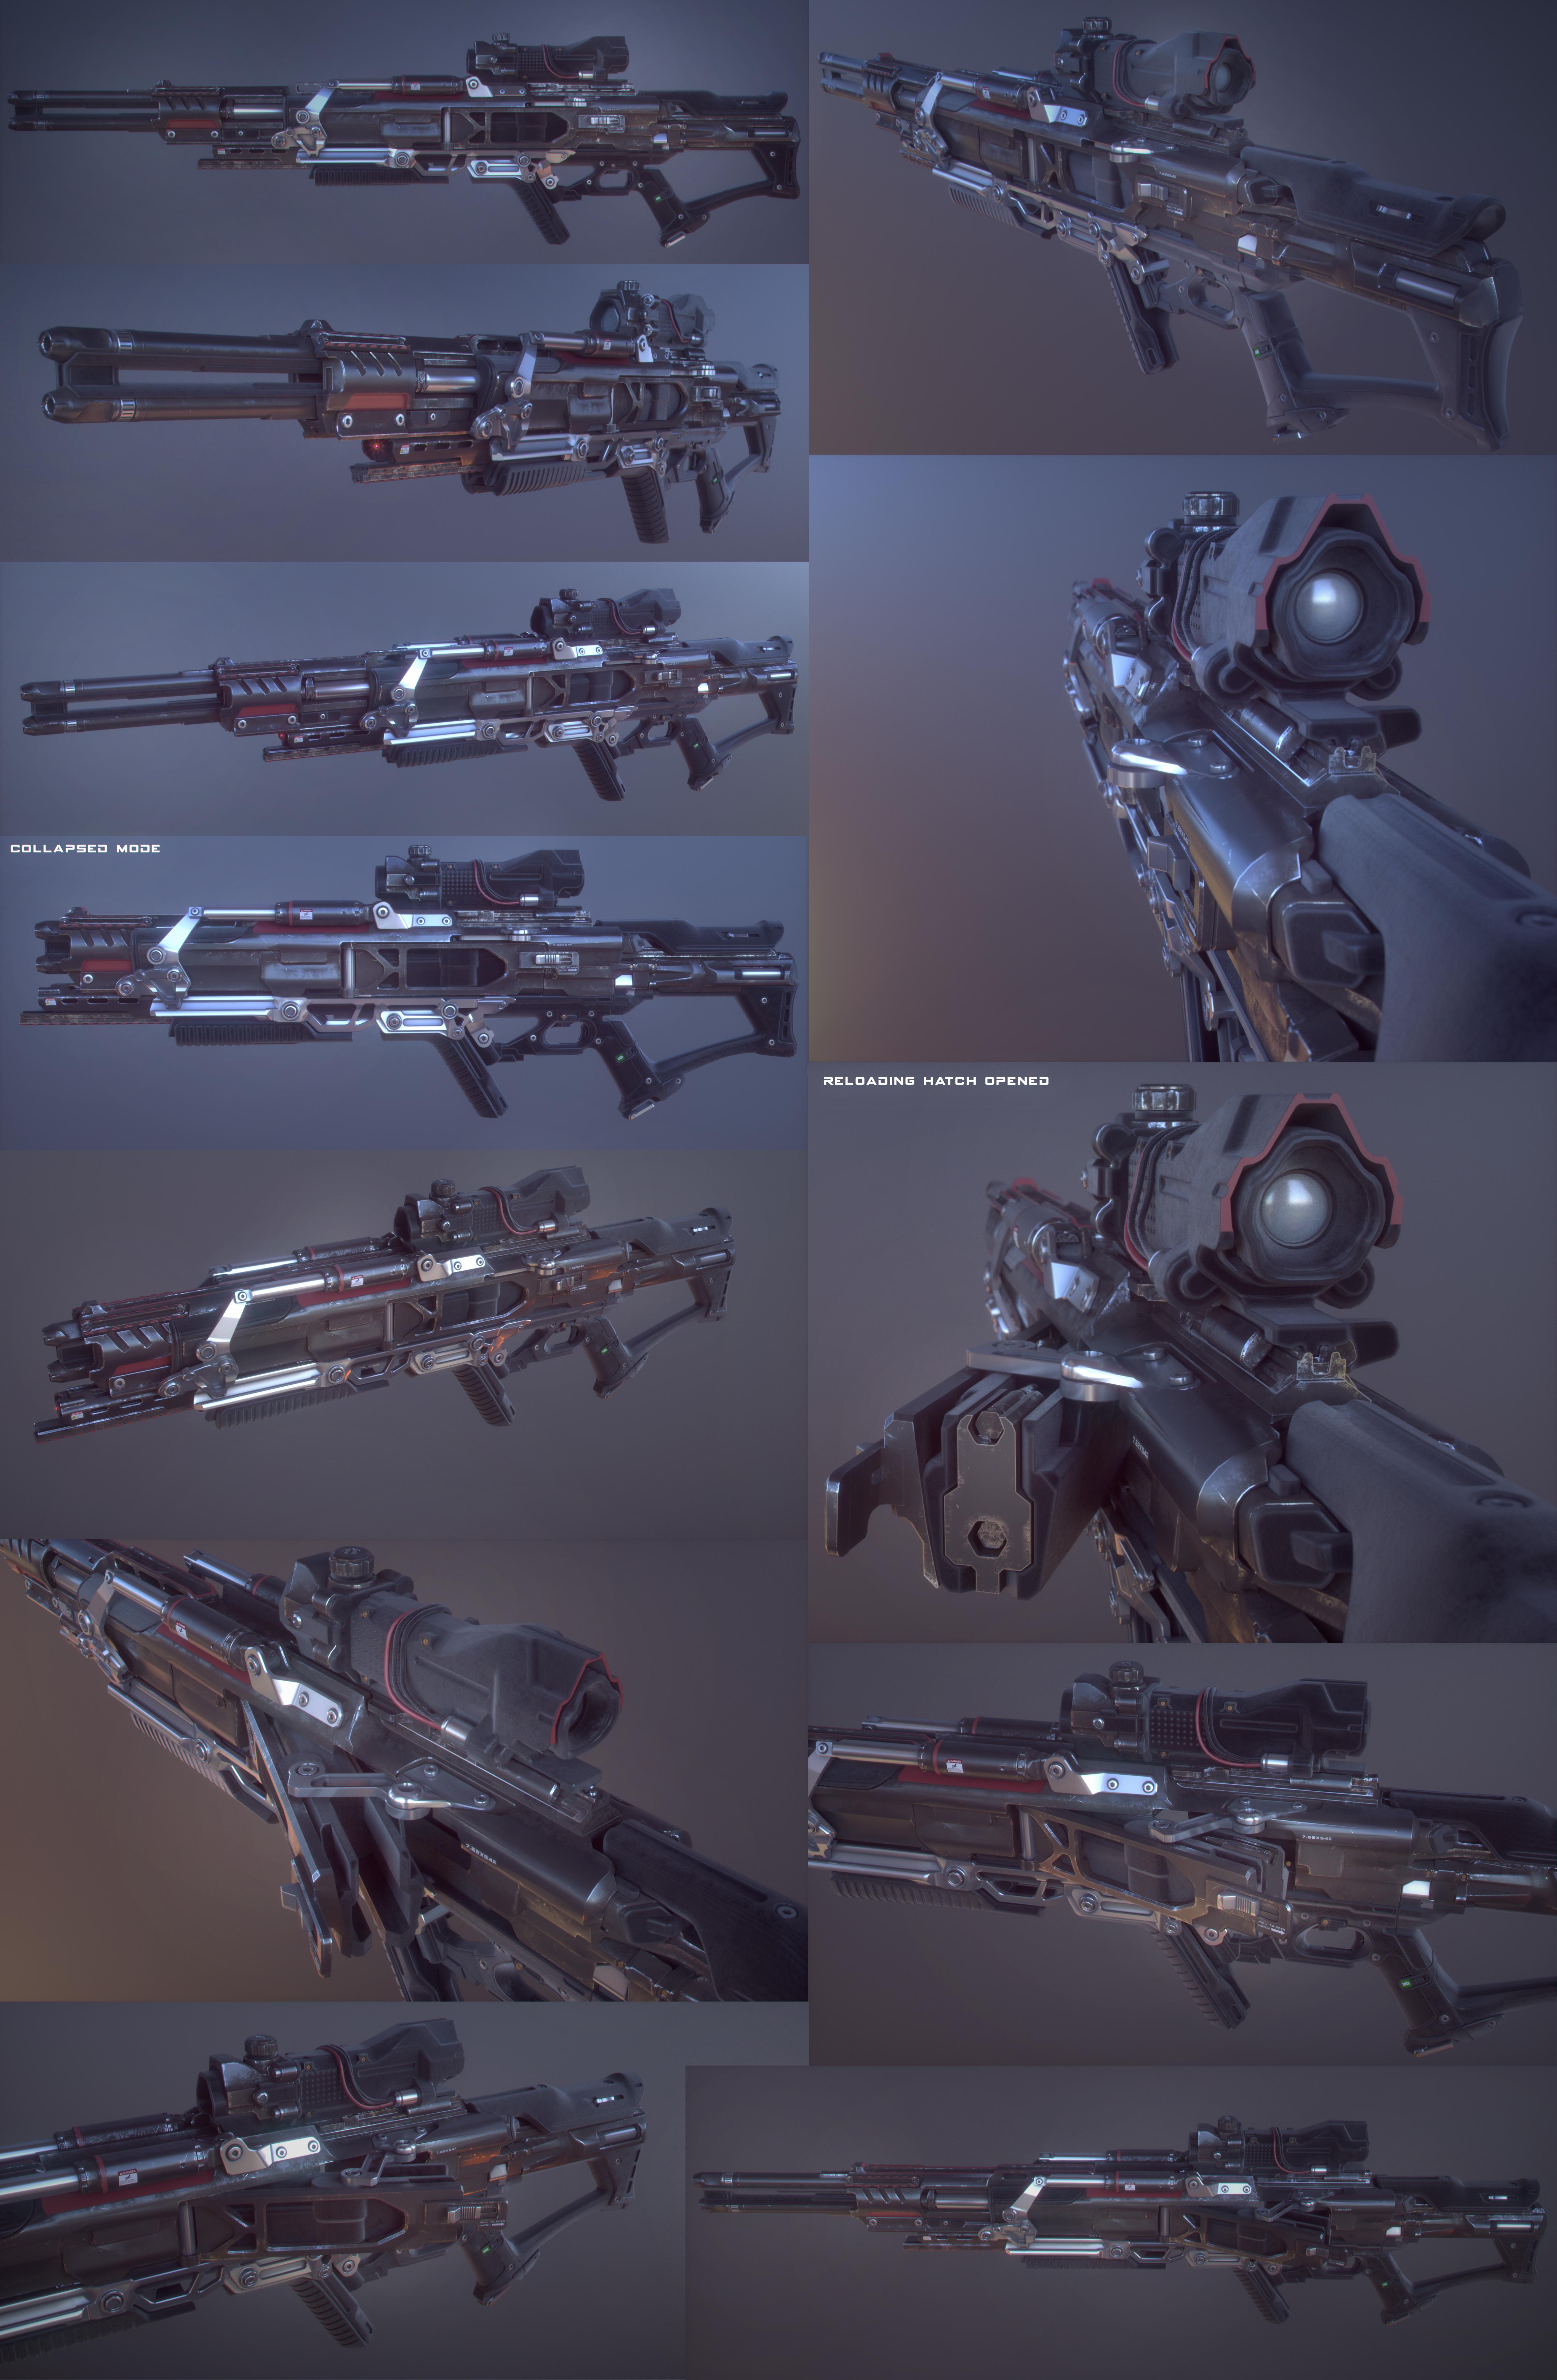 KSAR_reaper_sniper_rifle.jpg